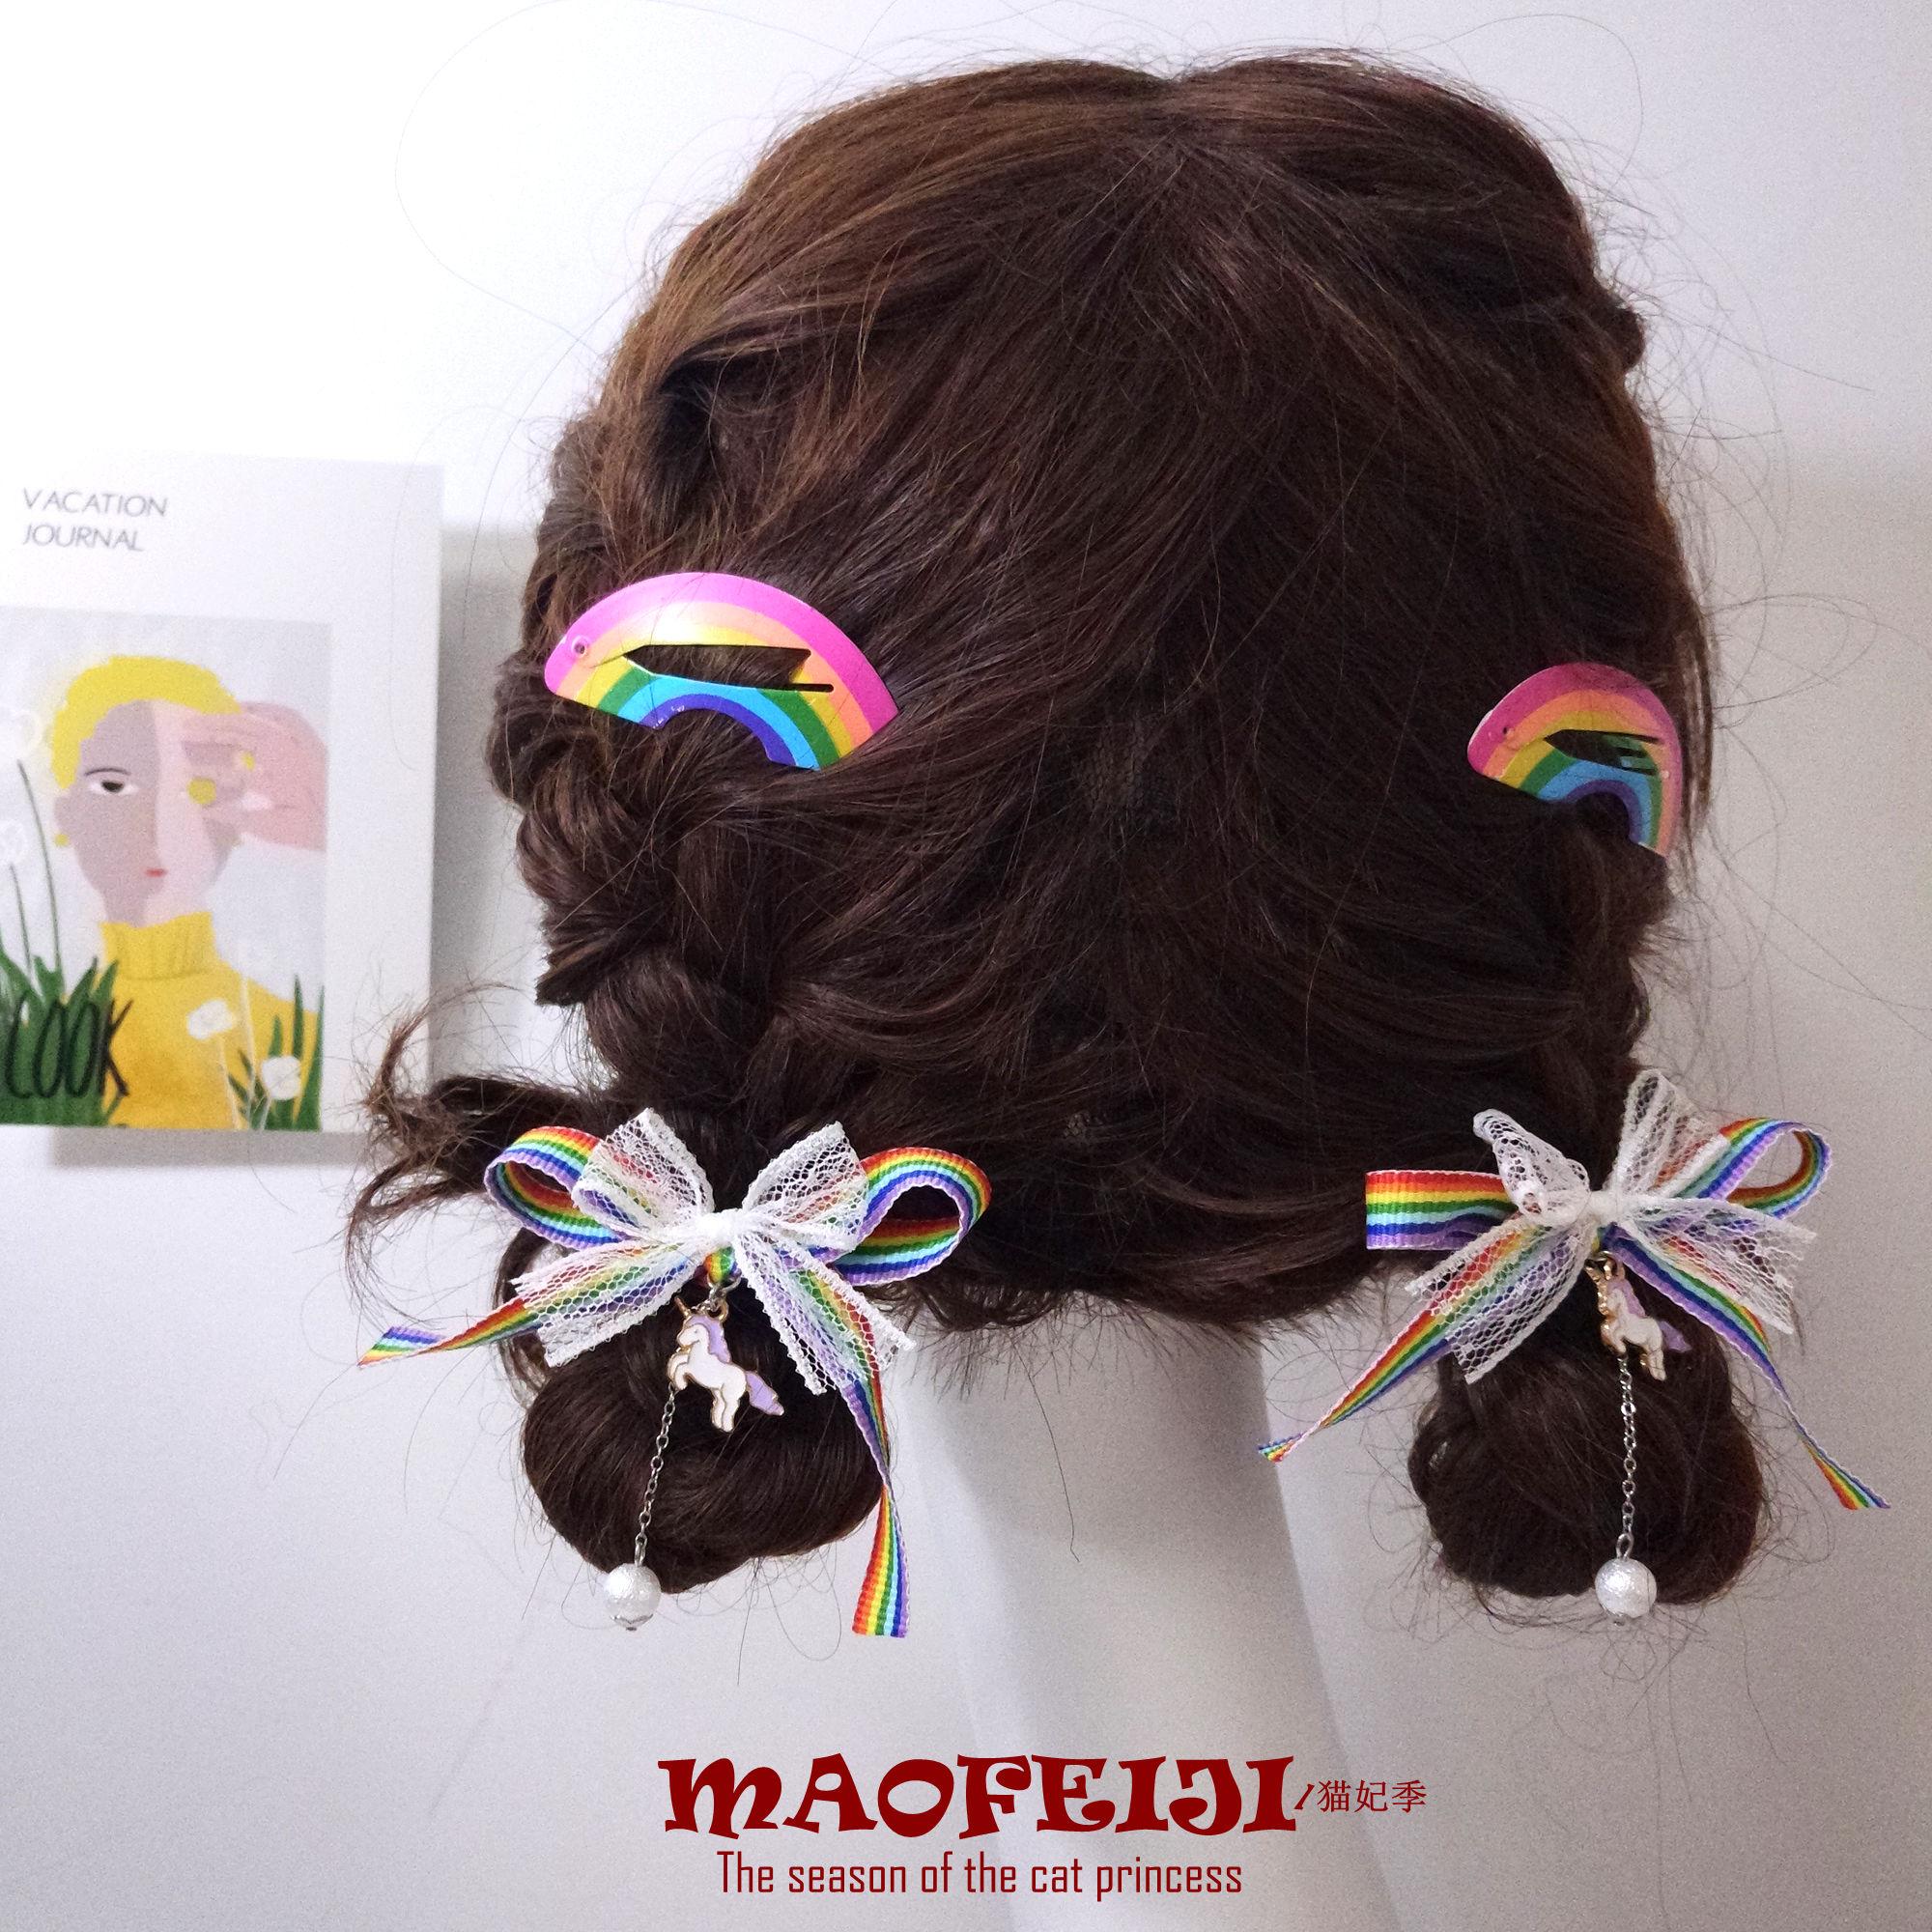 Arco-íris unicórnio menina bowknot duplo rabo de cavalo corda de cabelo lolita grampo de cabelo macio irmã acessórios de cabelo doce anéis de cabelo